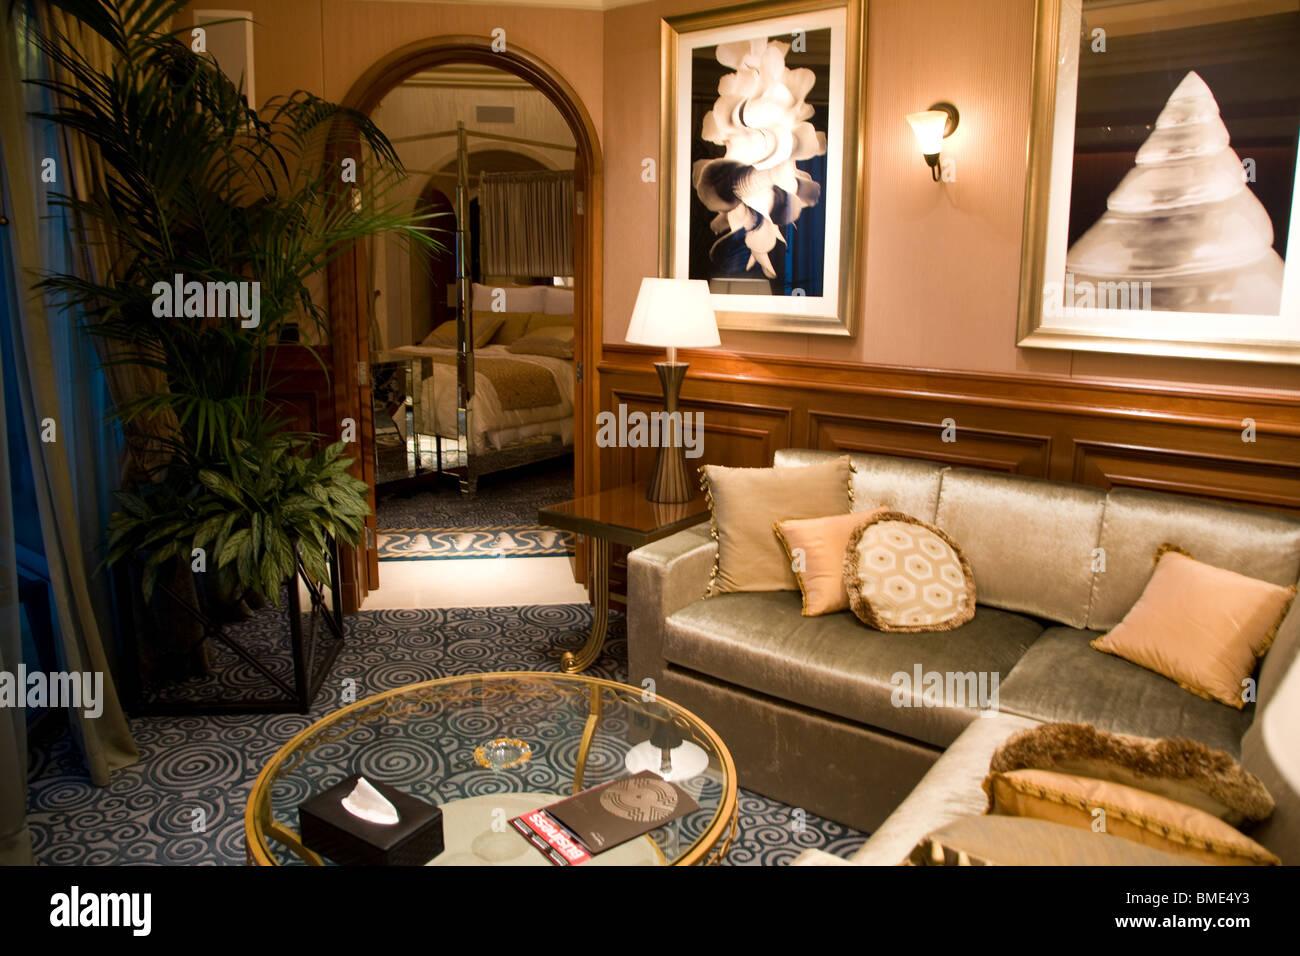 Royal Suite Atlantis Hotel Jumeirah Palm Dubai Uae United Arab Emirates    Stock Image